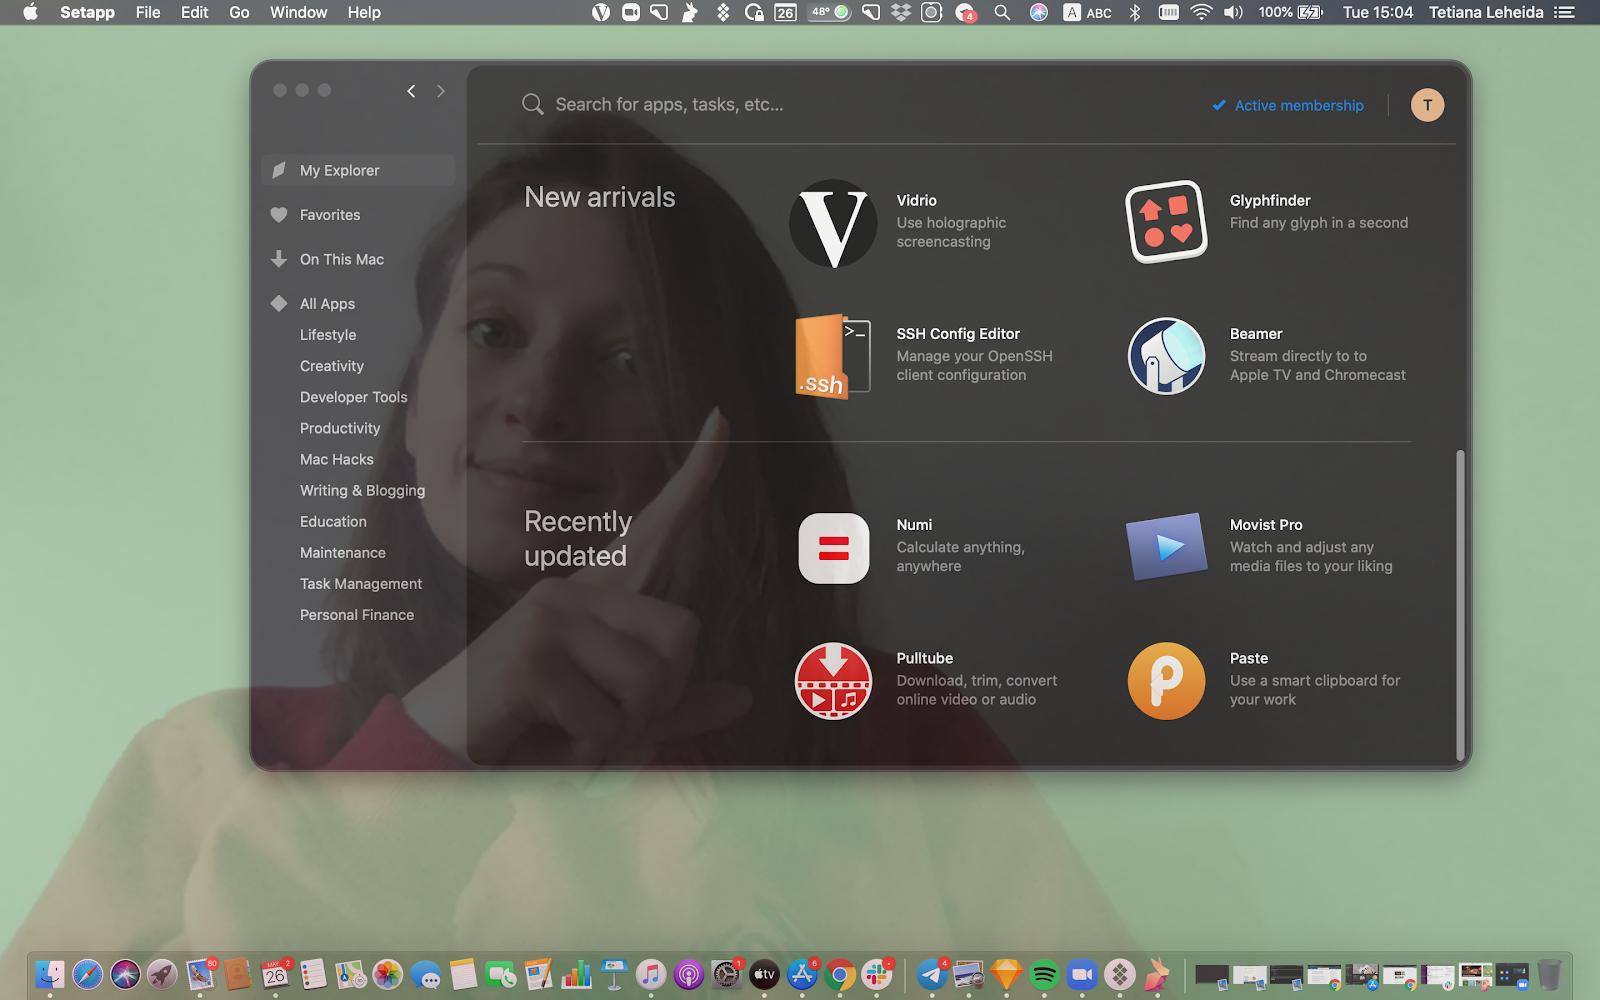 Vidrio app holographic screen sharing